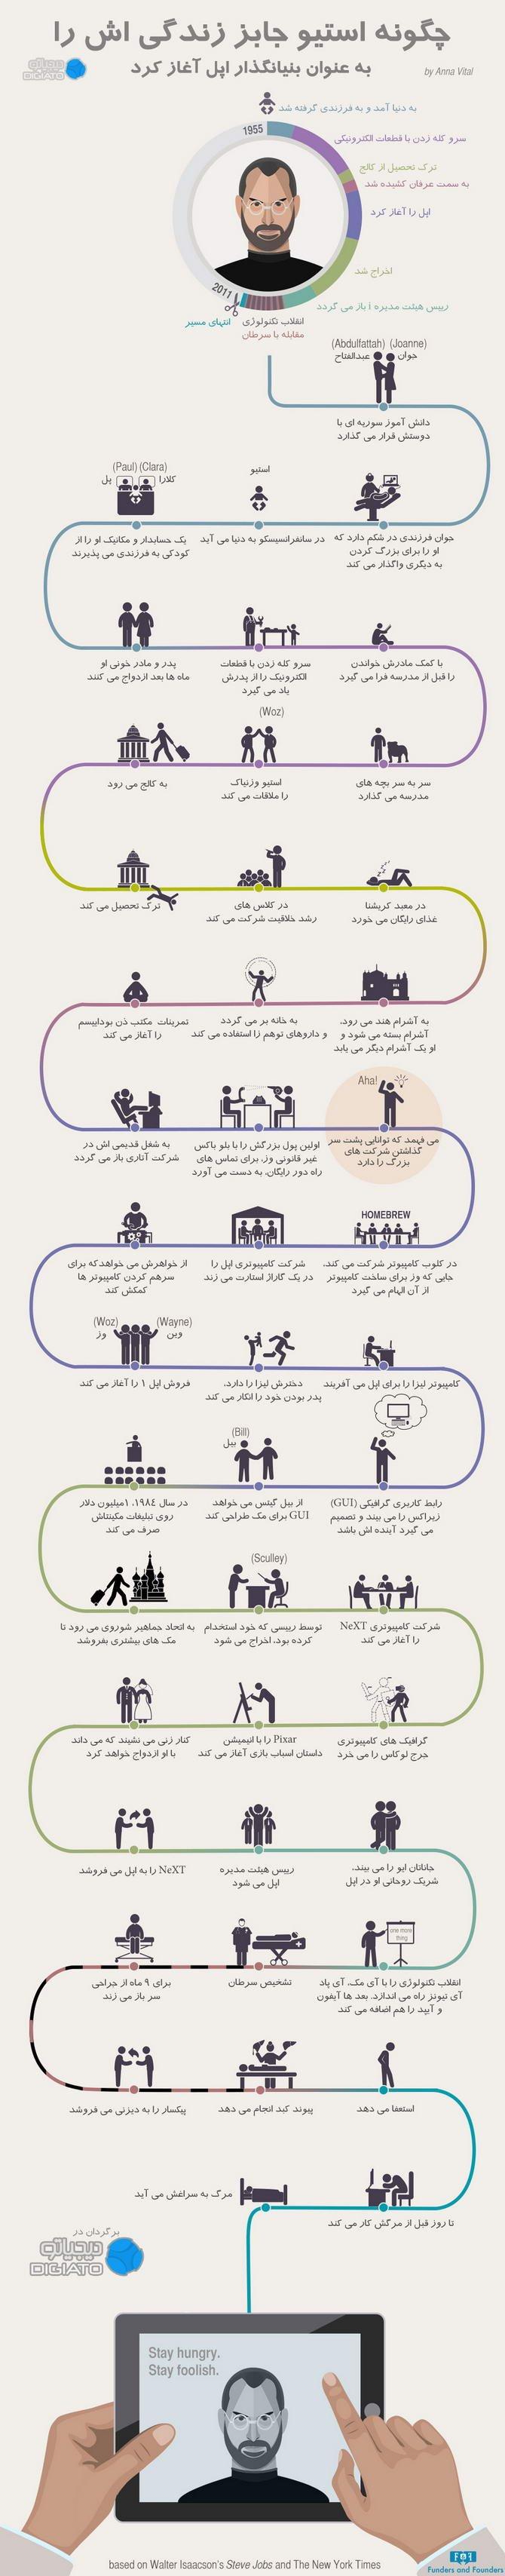 How-Steve-Jobs-Started-apple-founder-infographic-digiato (1)_resize